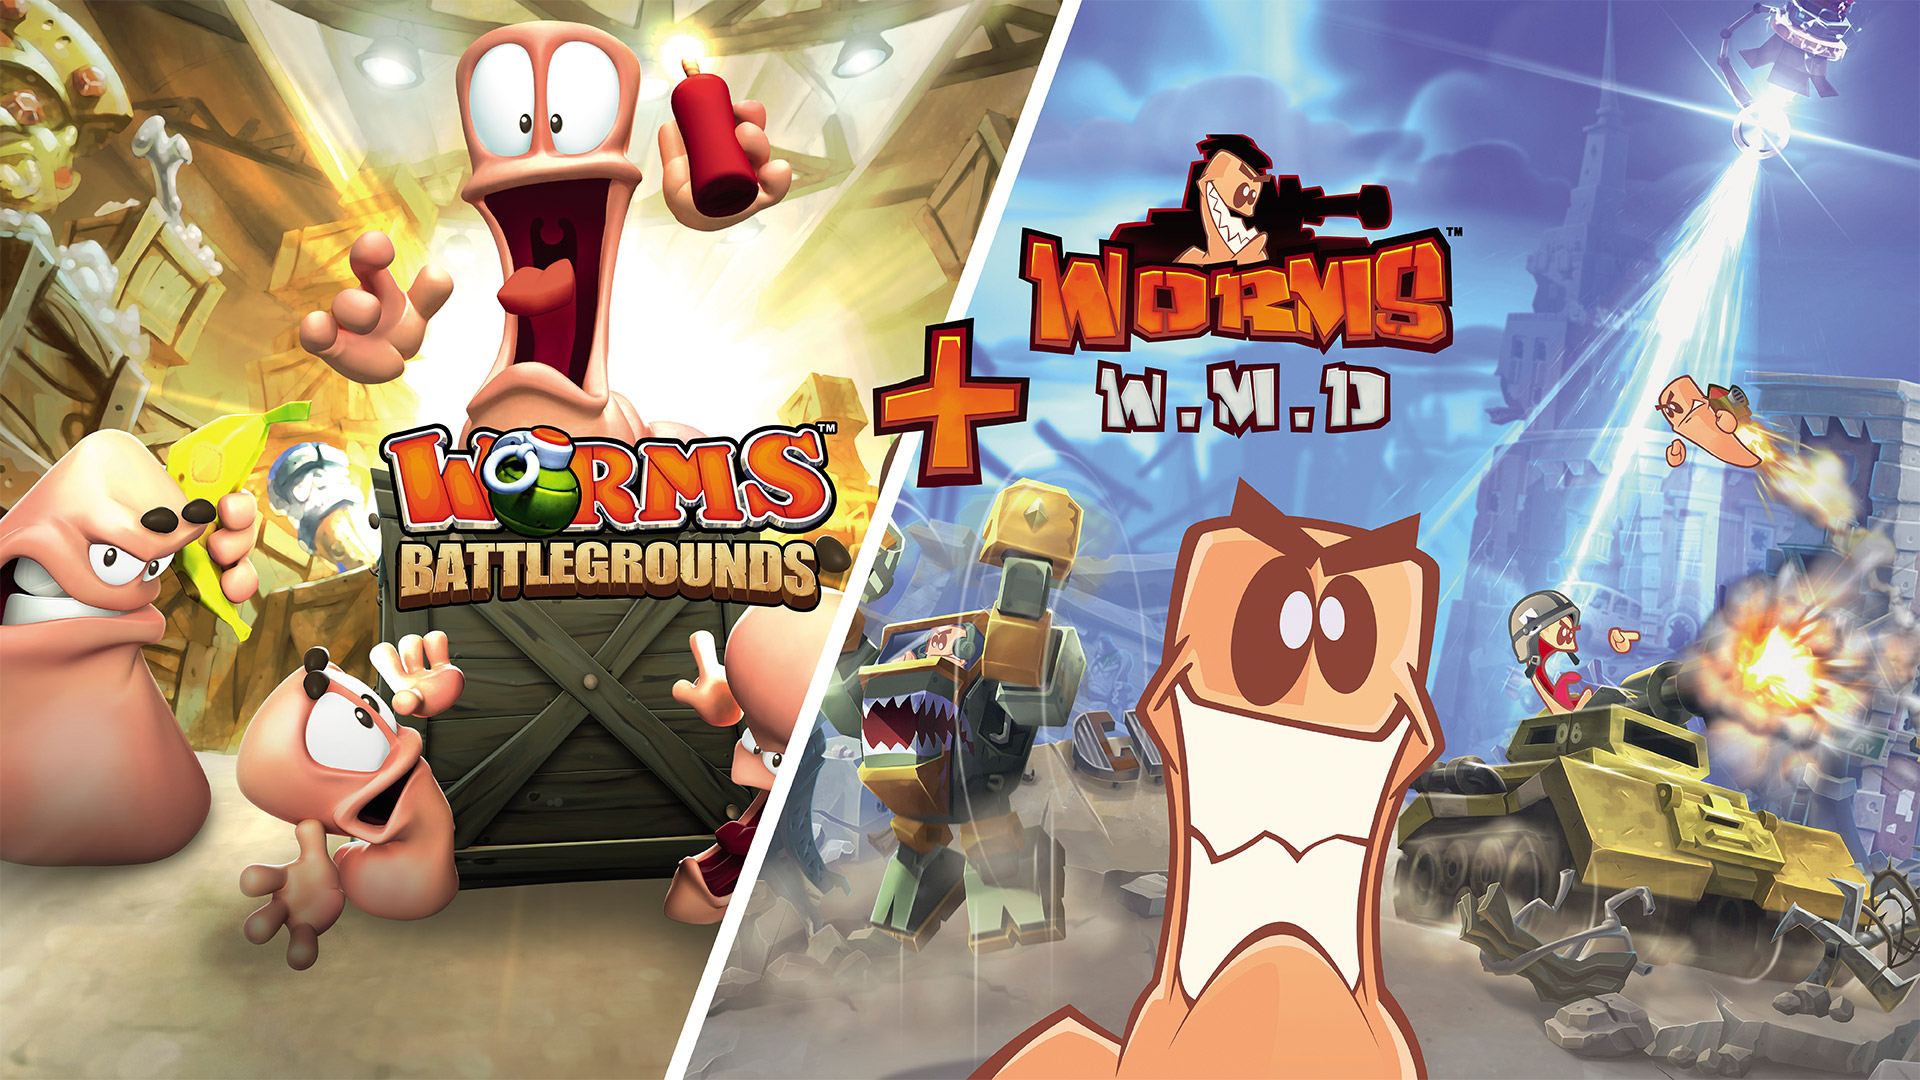 Worms_artwork_videogame_packshot